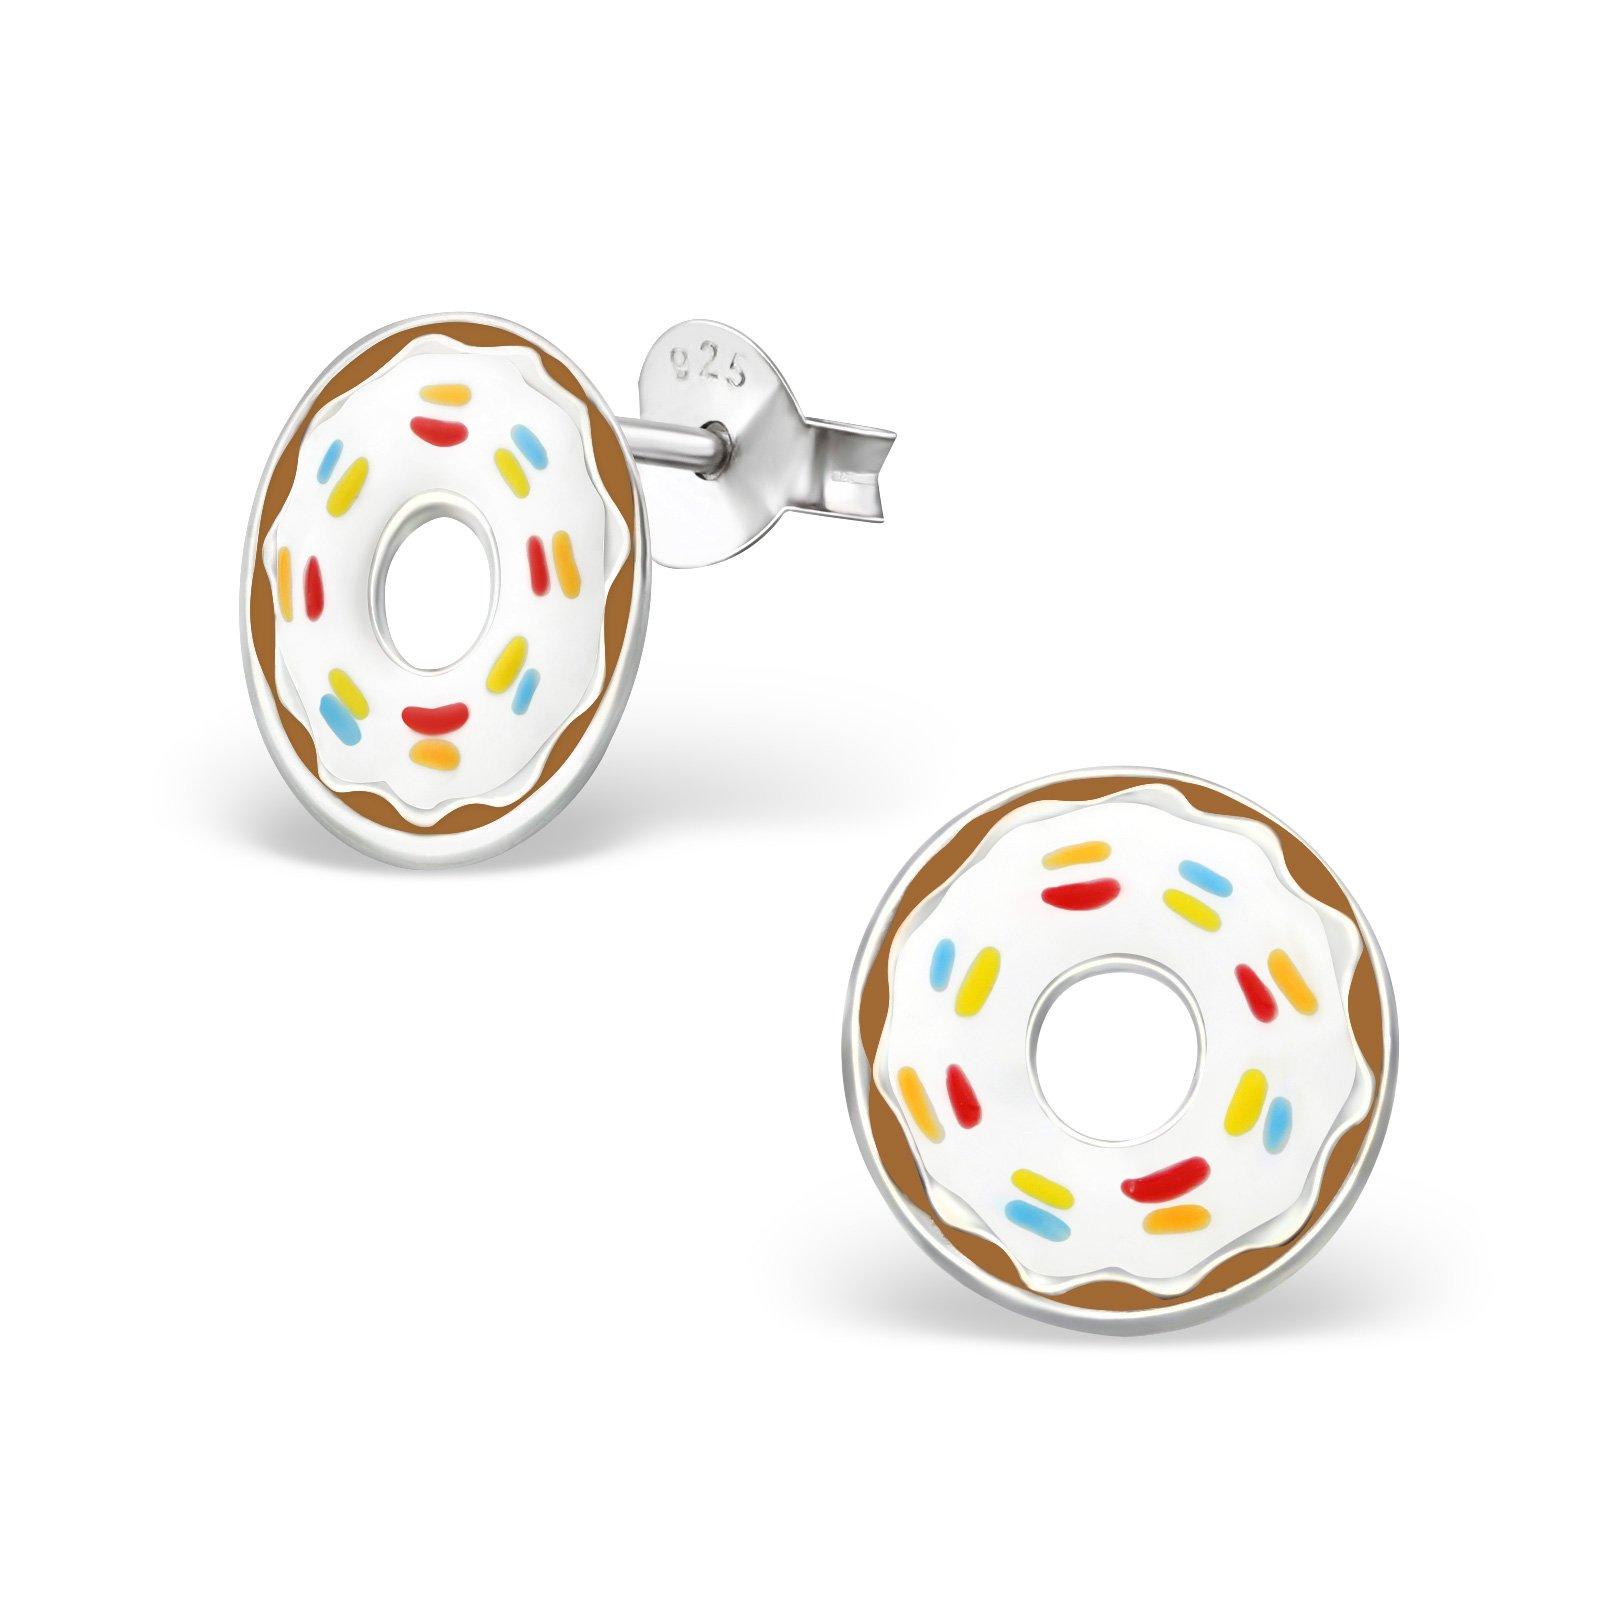 Hypoallergenic Doughnut Stud Earrings for Girls (Nickel Free and Safe for Sensitive Ears)